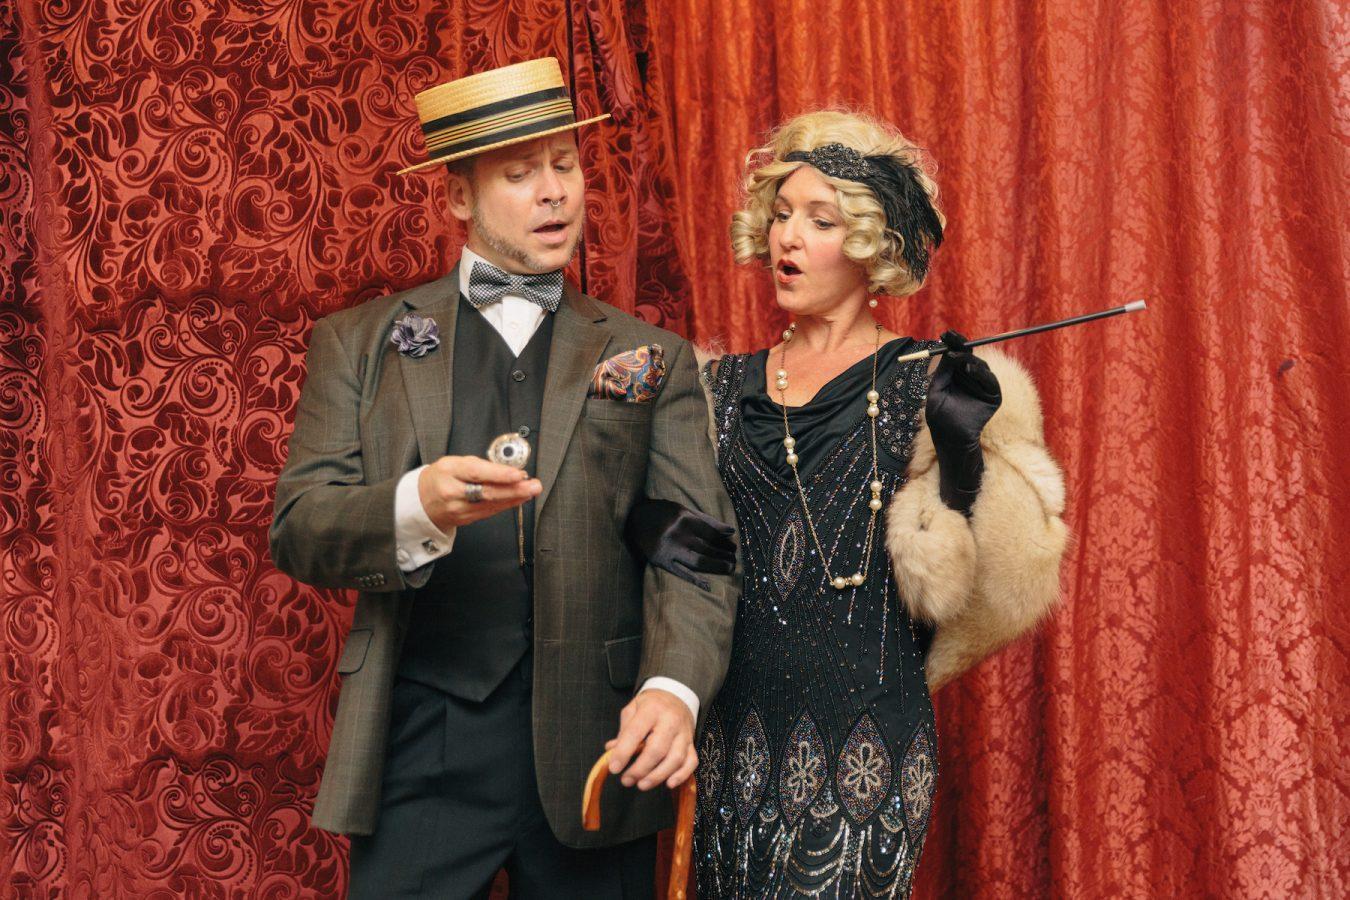 Roaring Twenties: Prohibition New Year's Eve at Morgan MFG